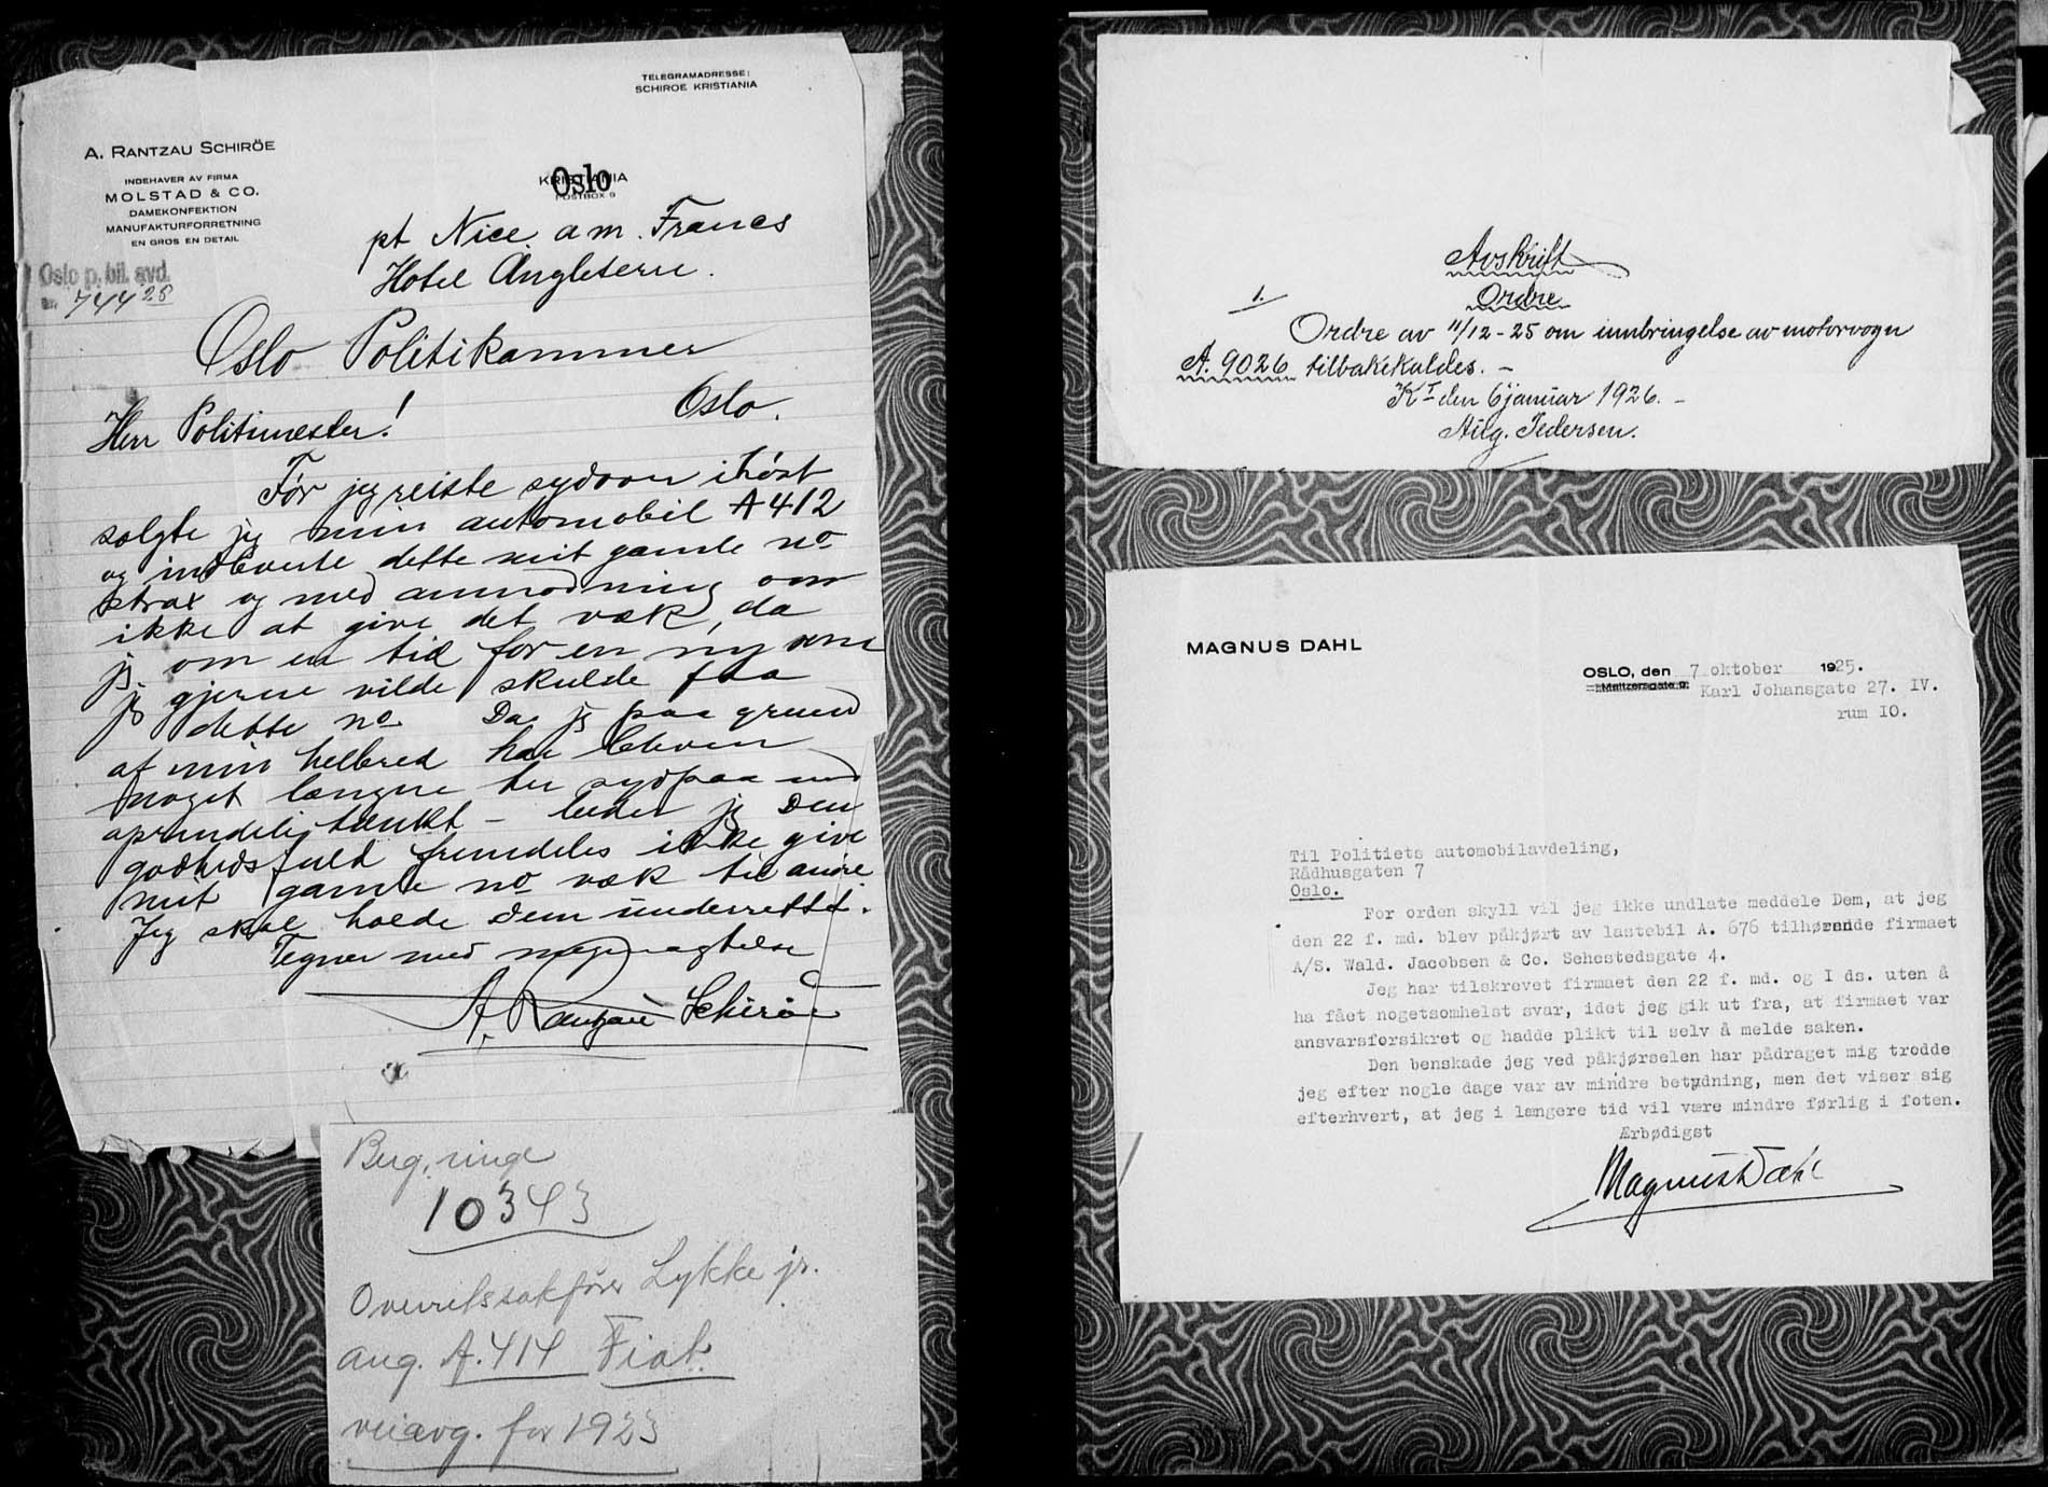 RA, Vegdirektoratet, Bilavdelingen M, F/Fa/L0002: Bilregisterprotokoll. Reg.nr. A1-A29 og A400-A902, 1913-1926